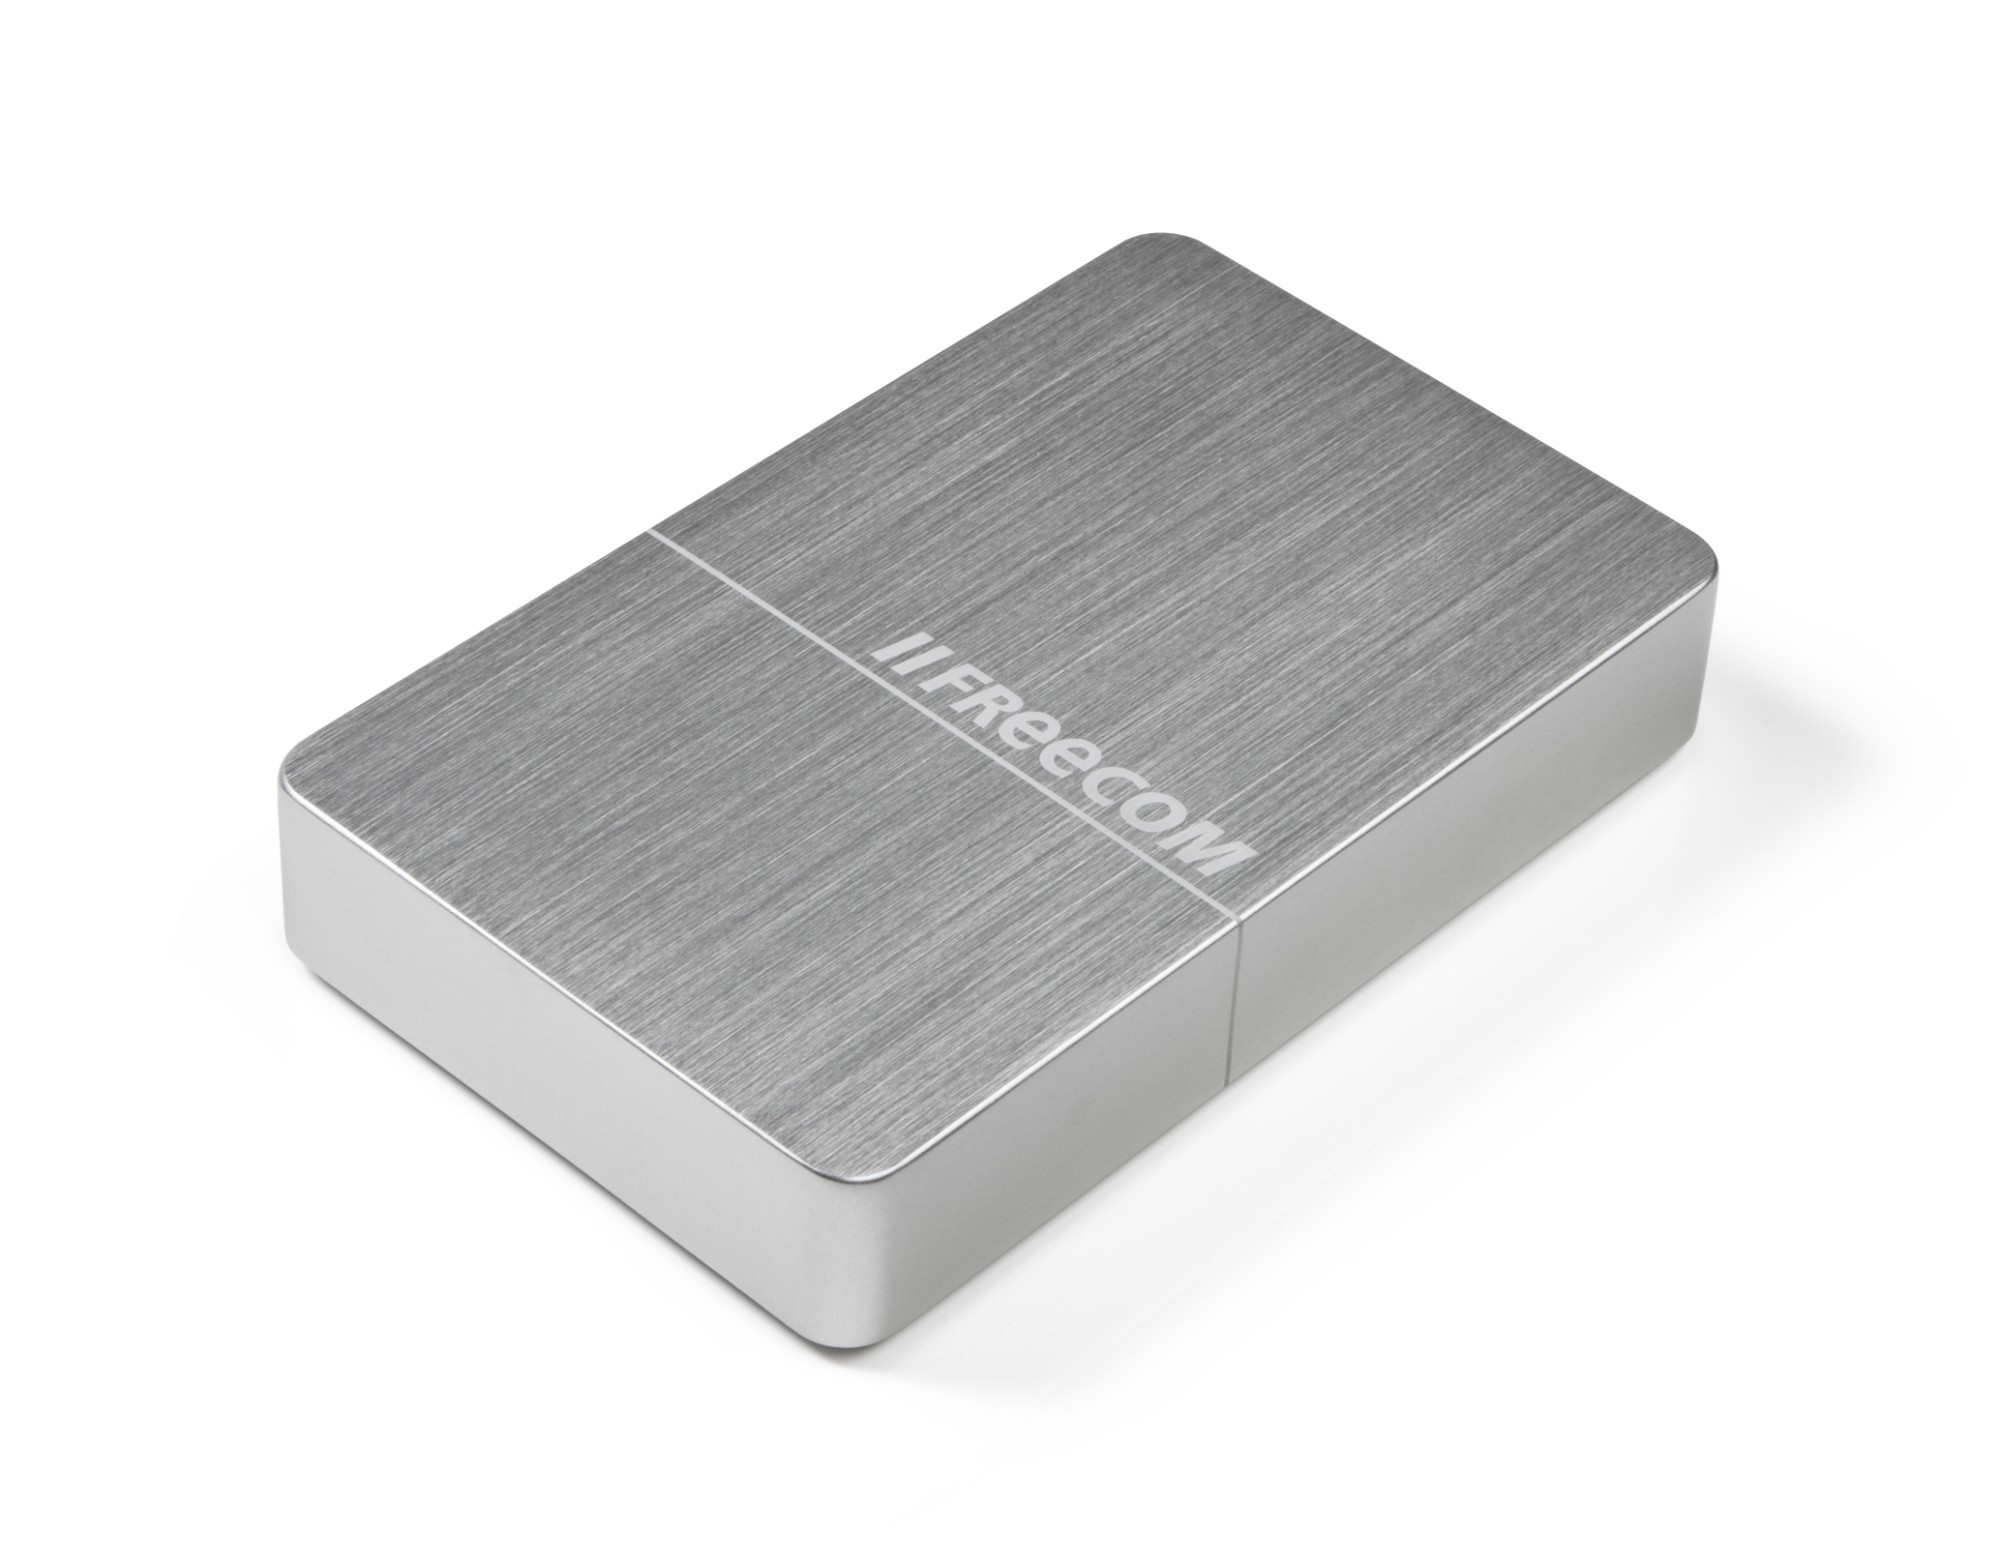 MHDD Desktop Drive - 4TB Silver